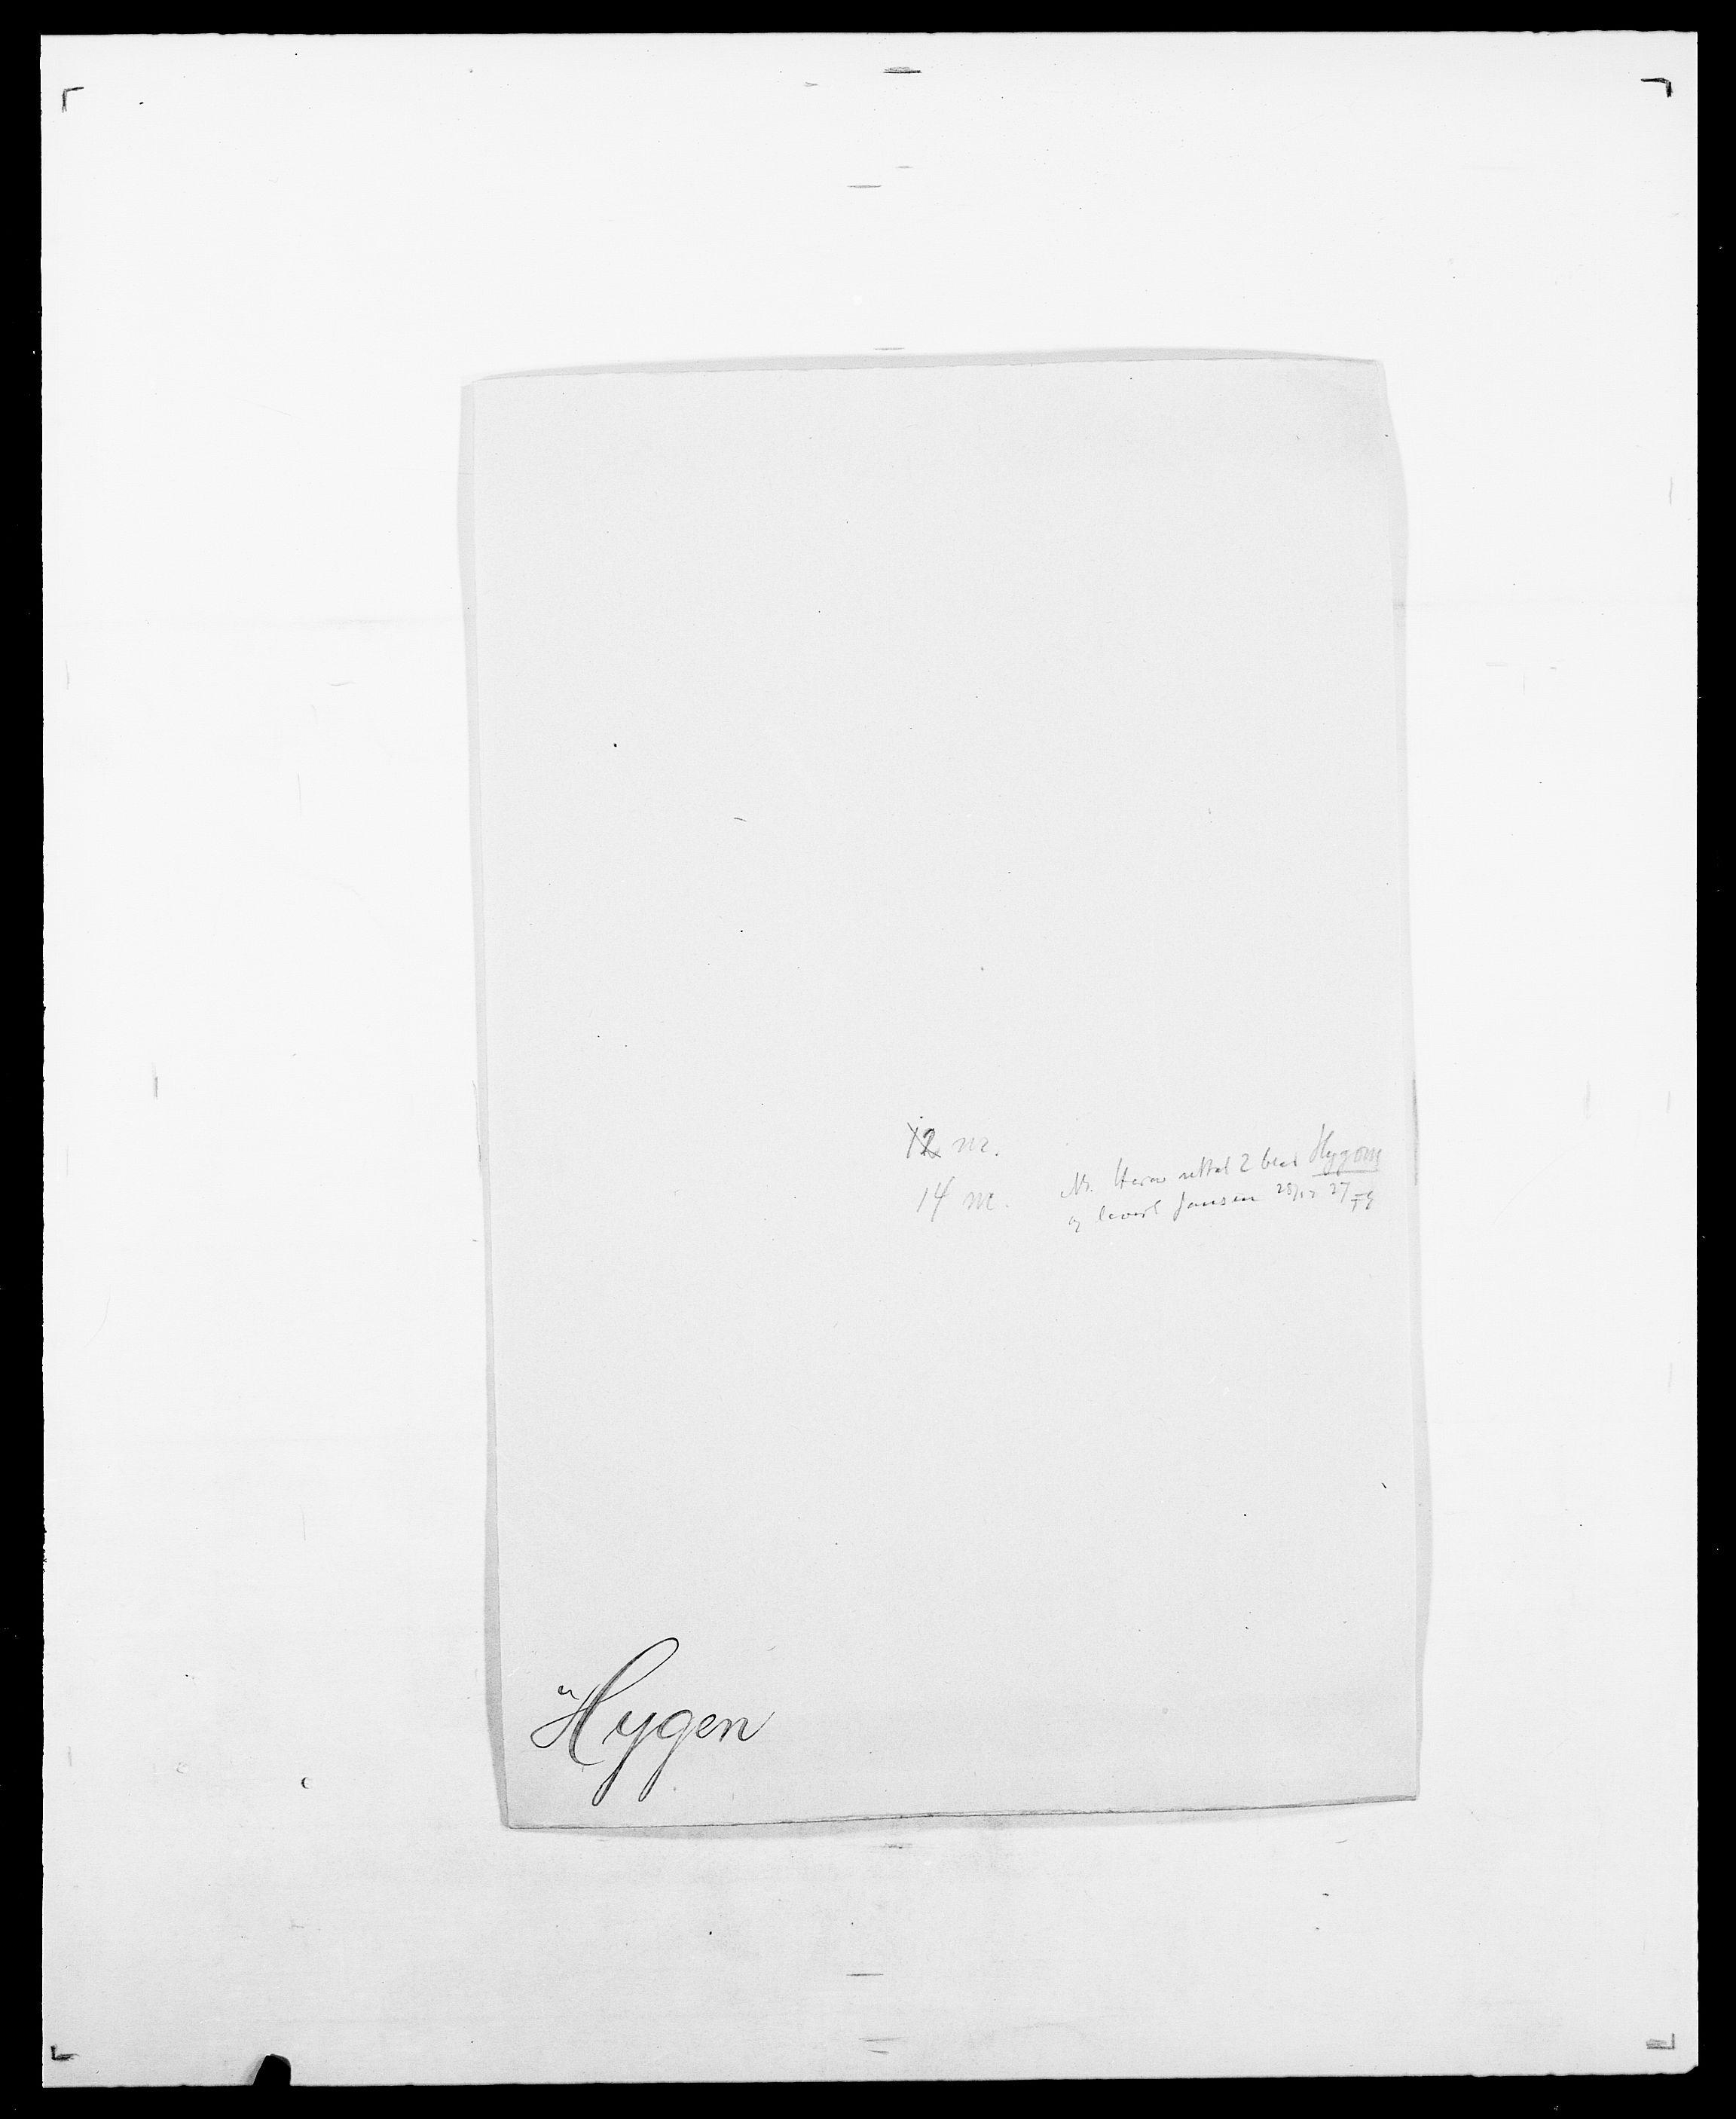 SAO, Delgobe, Charles Antoine - samling, D/Da/L0019: van der Hude - Joys, s. 245